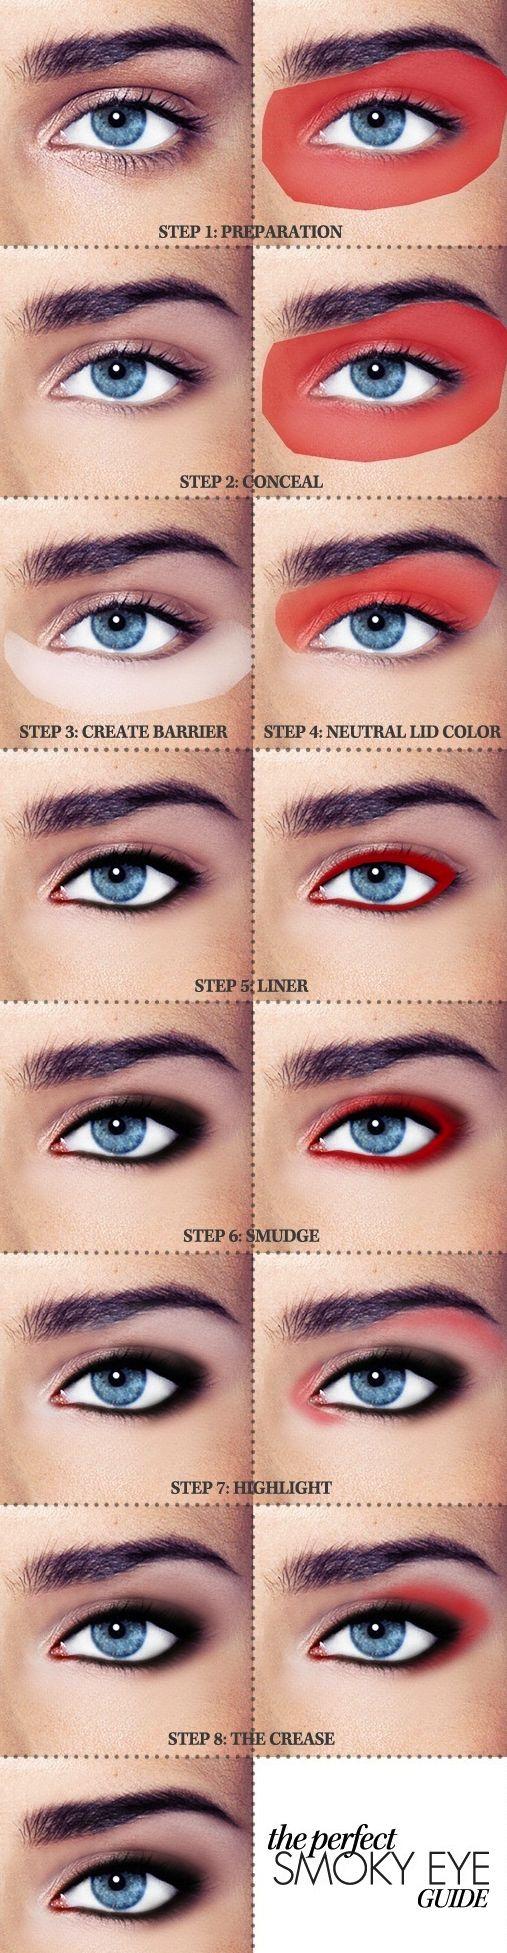 ff763ec604135b9b9046344c62eacb9a - maquillar ojos pequeños mejores equipos